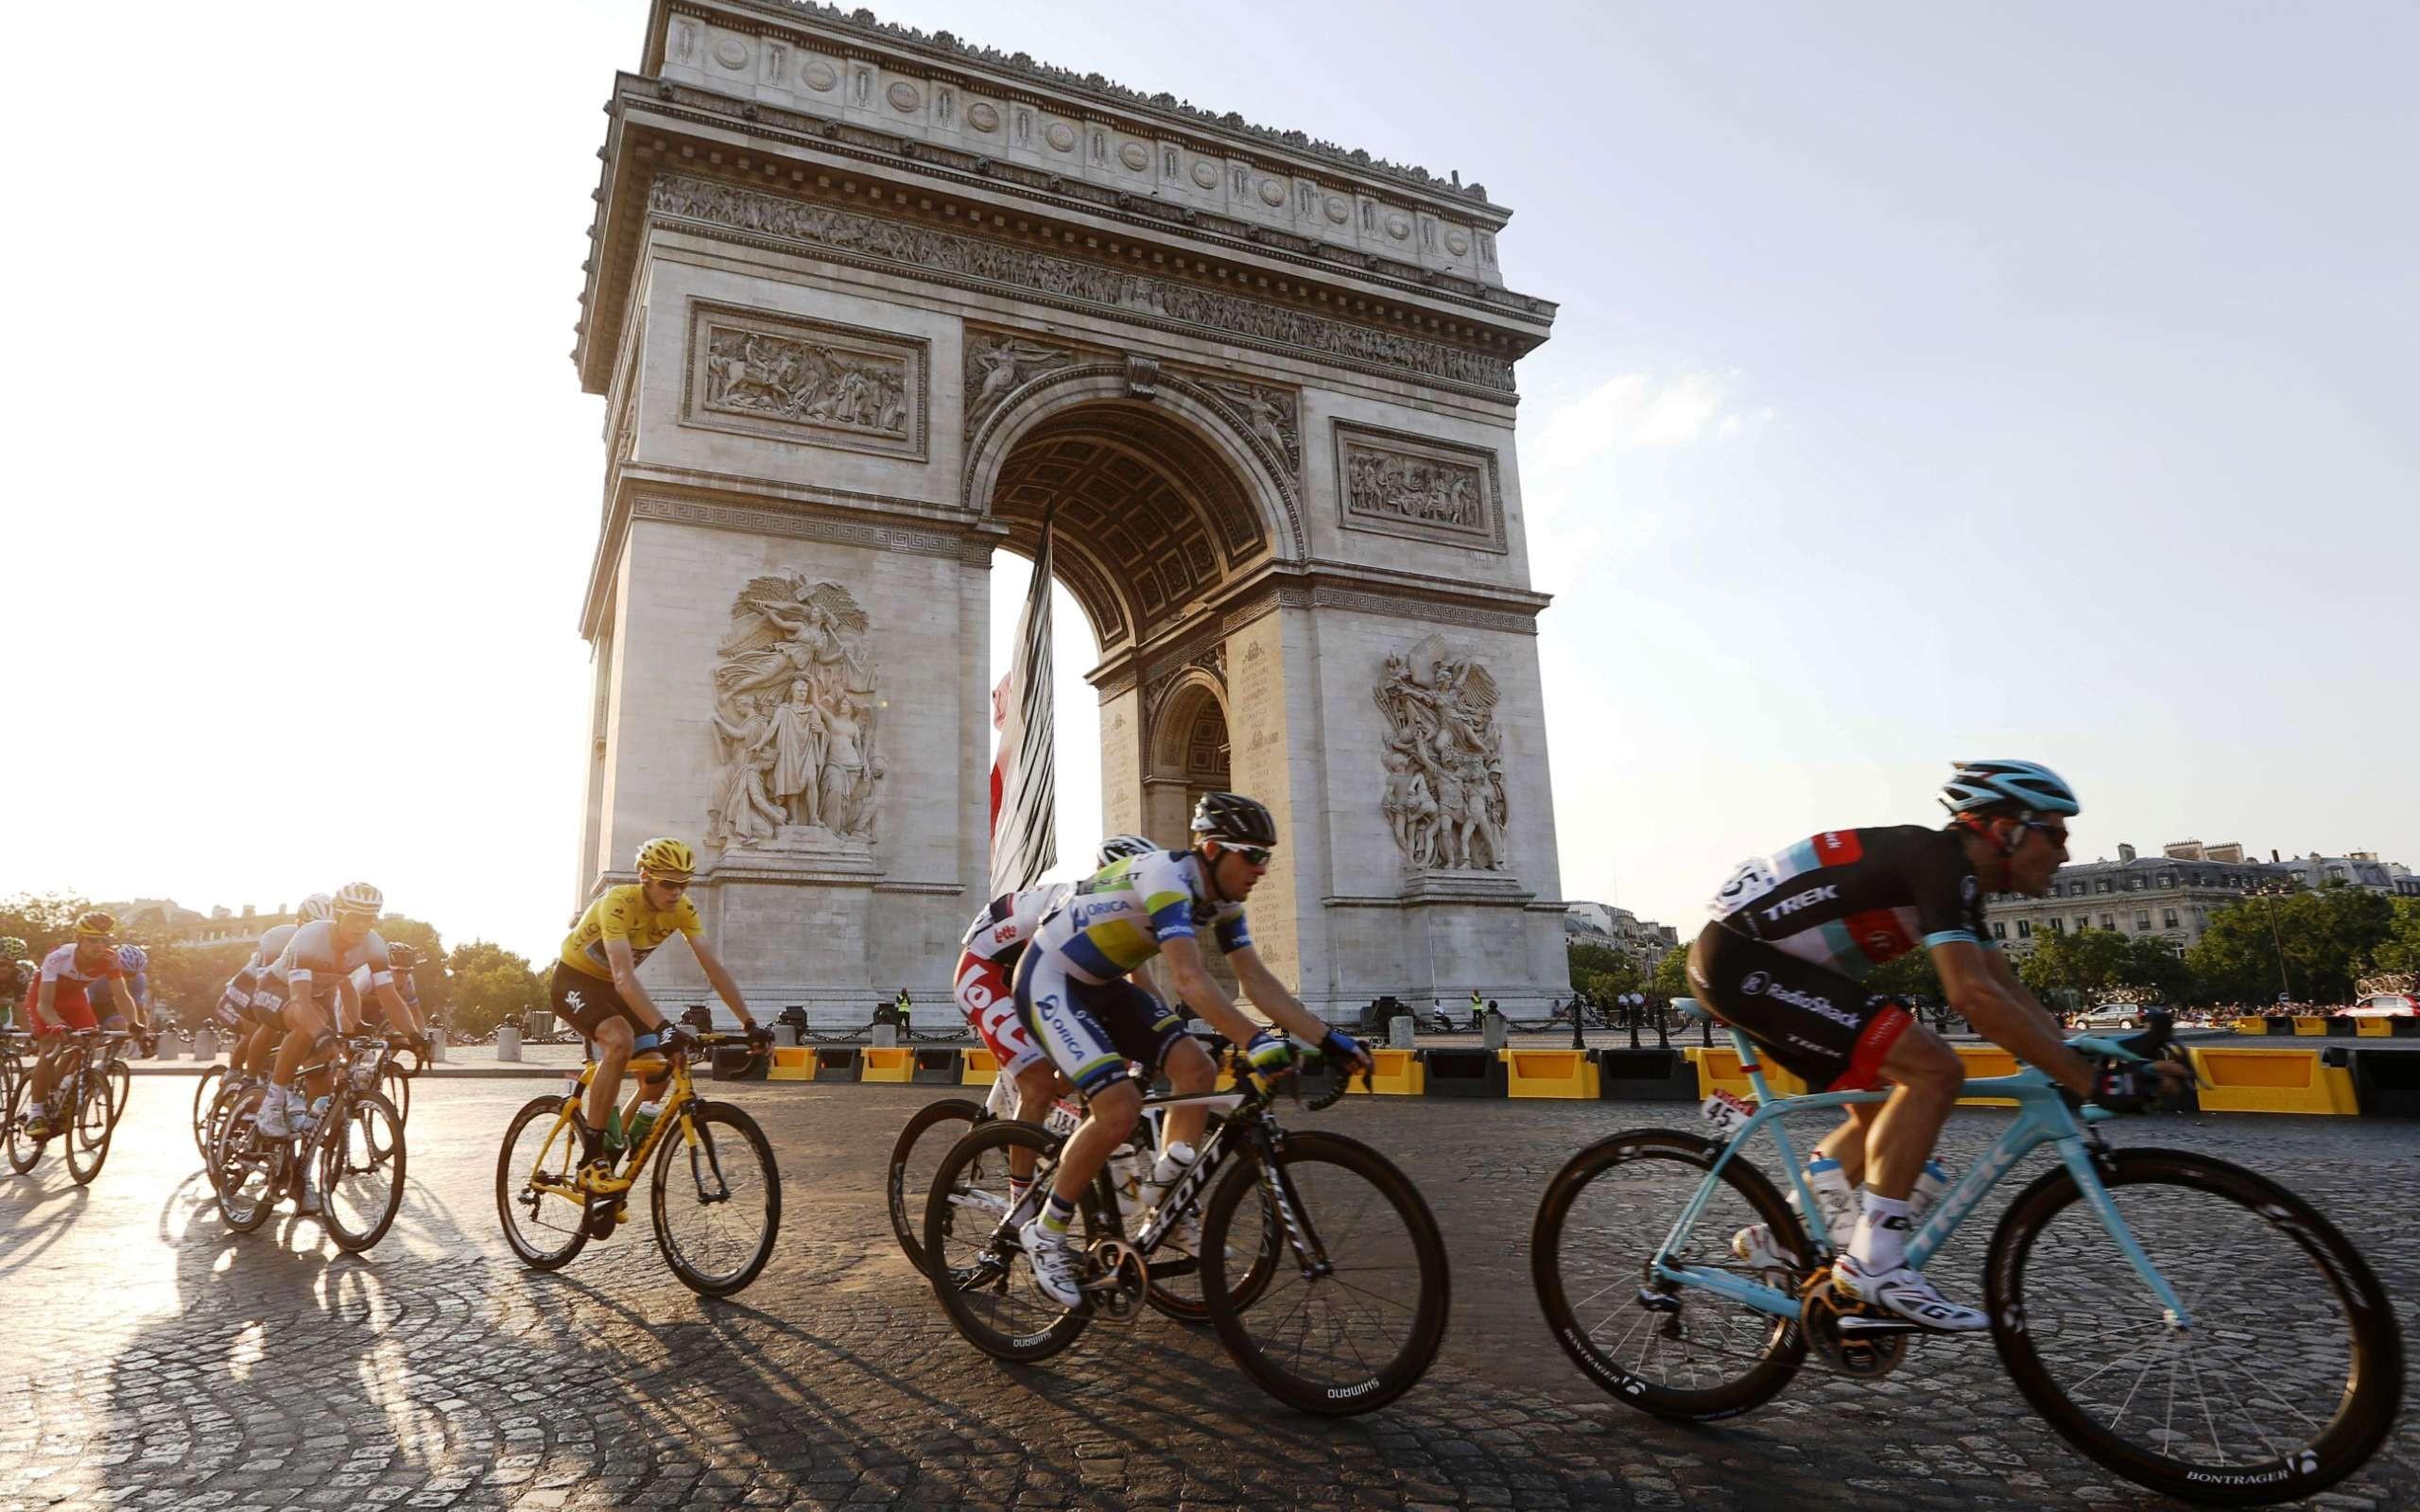 Paris Eiffel Tower Arc de Triomphe France Wall Mural Photo Wallpaper Picture